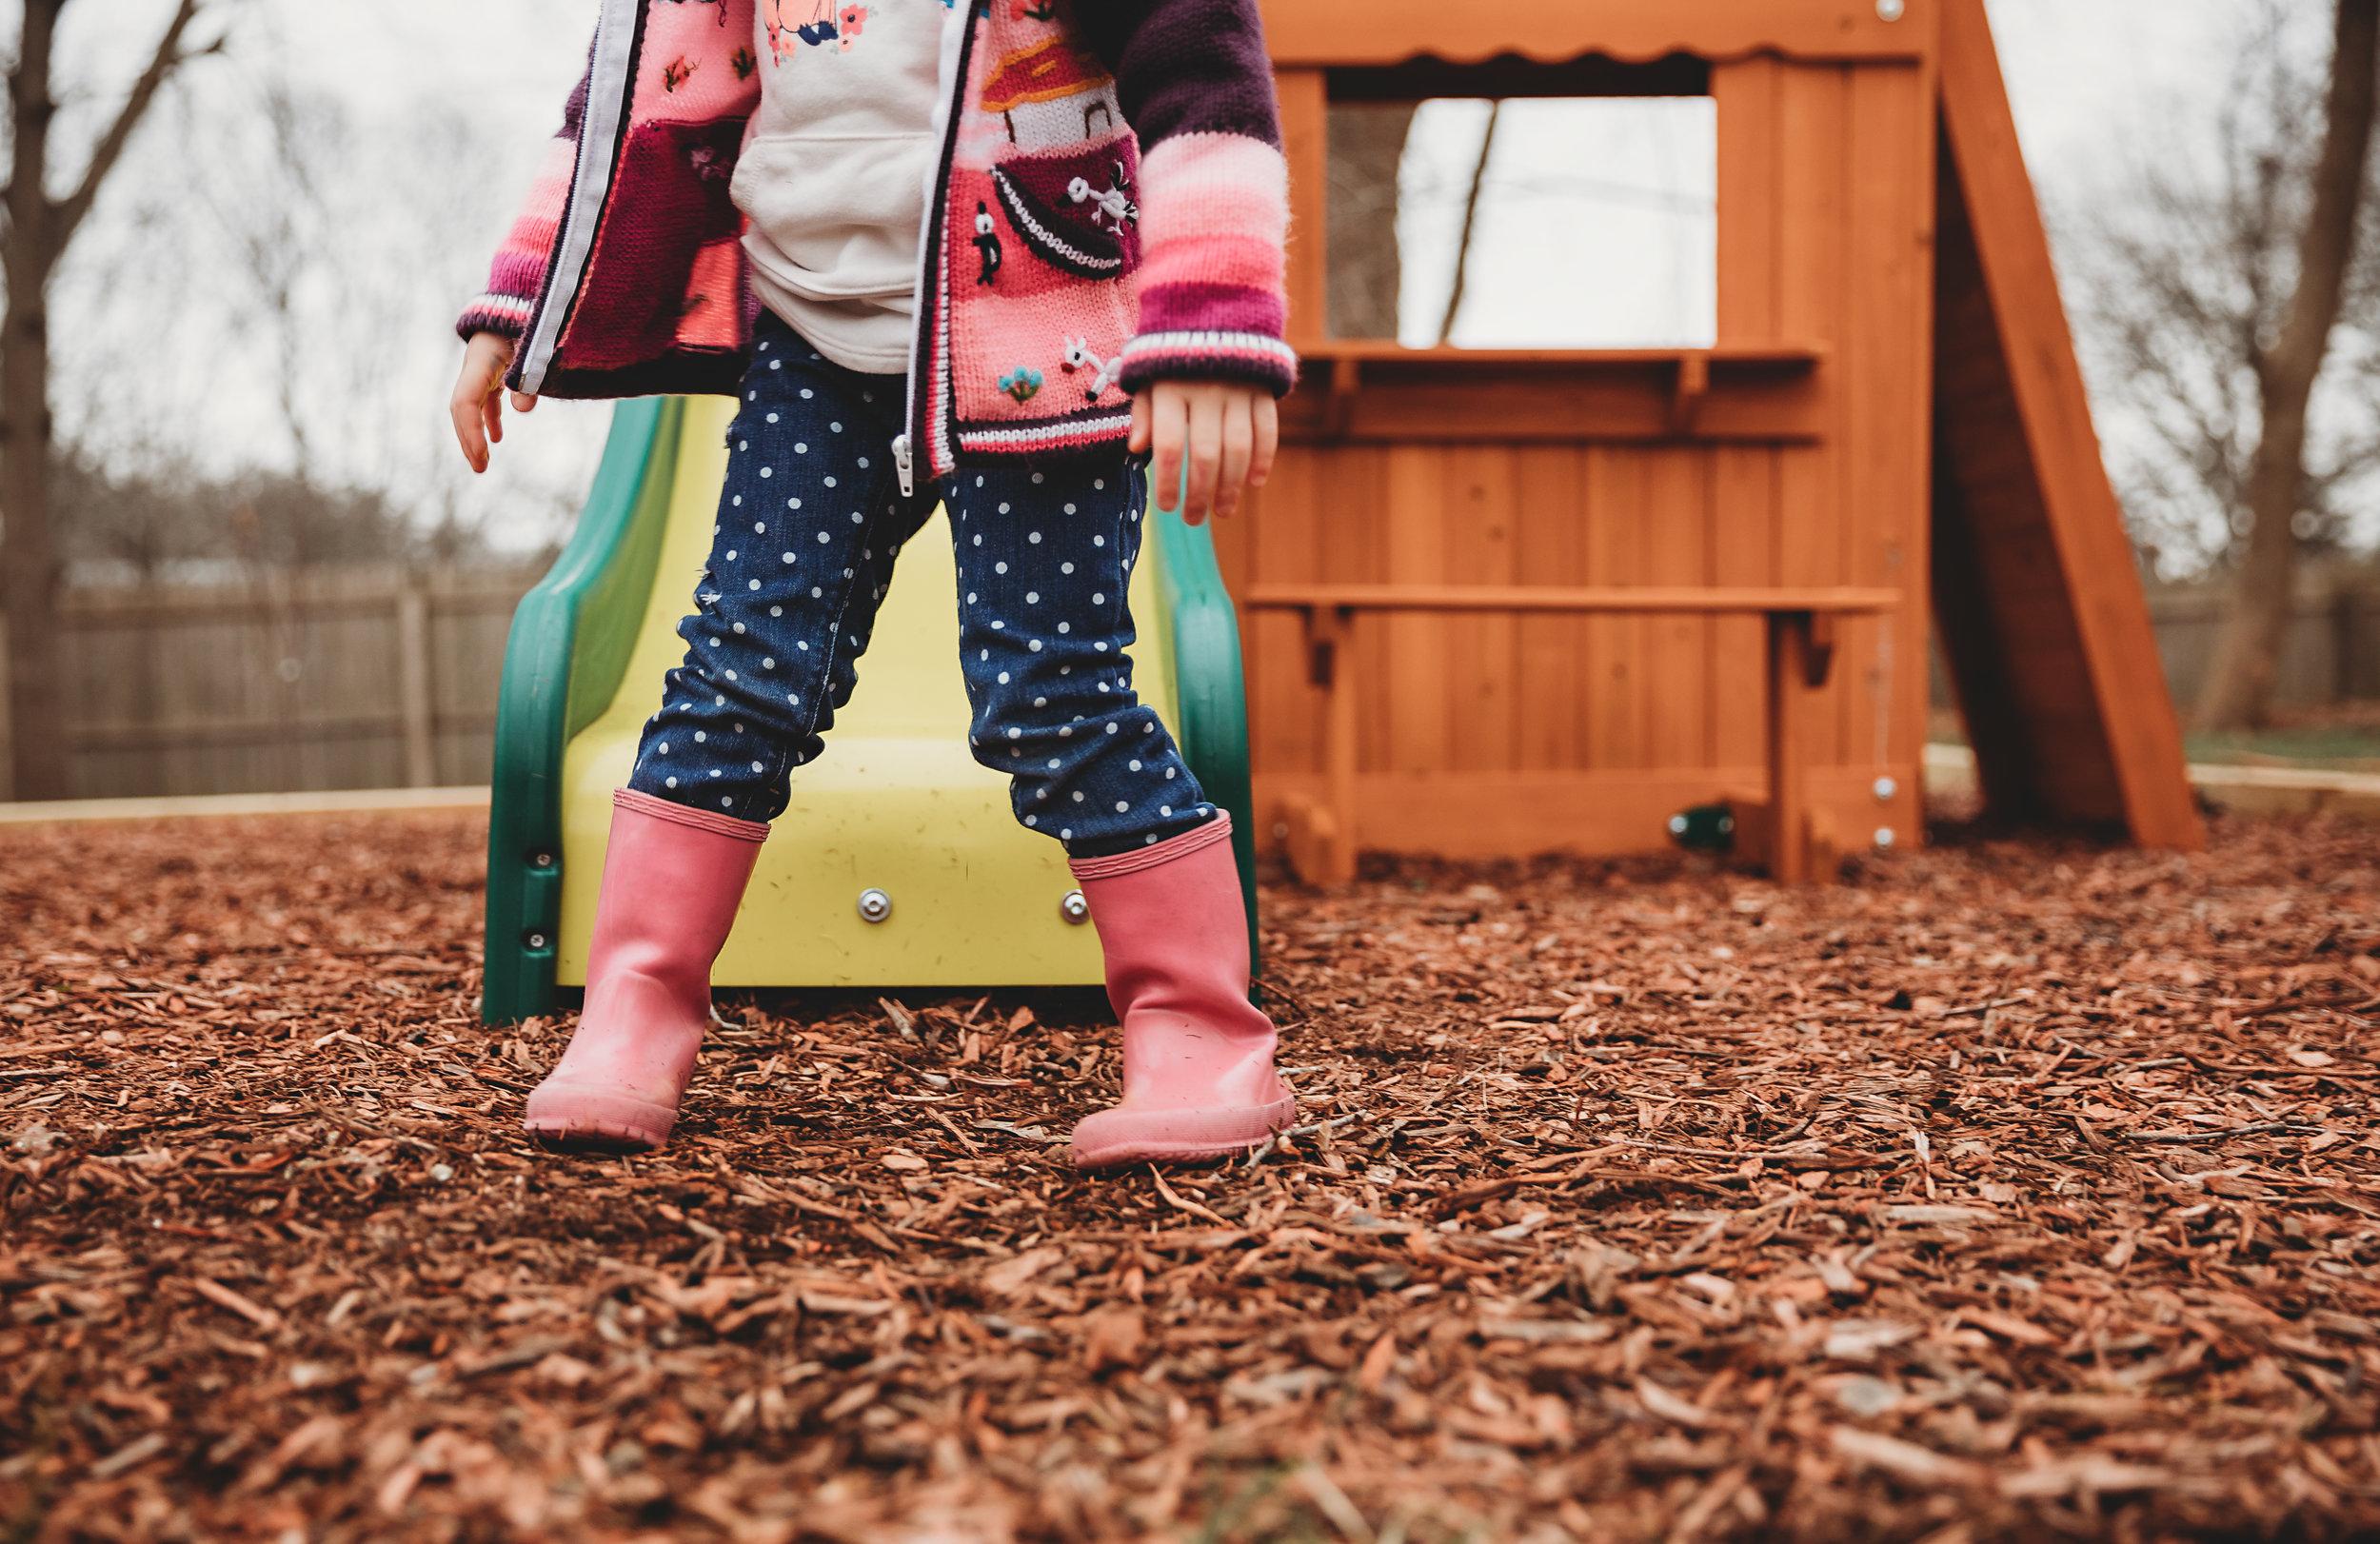 hello-olivia-photography-long-island-photographer-lifestyle-child-girl-pink-boots-playground-faceless.jpg